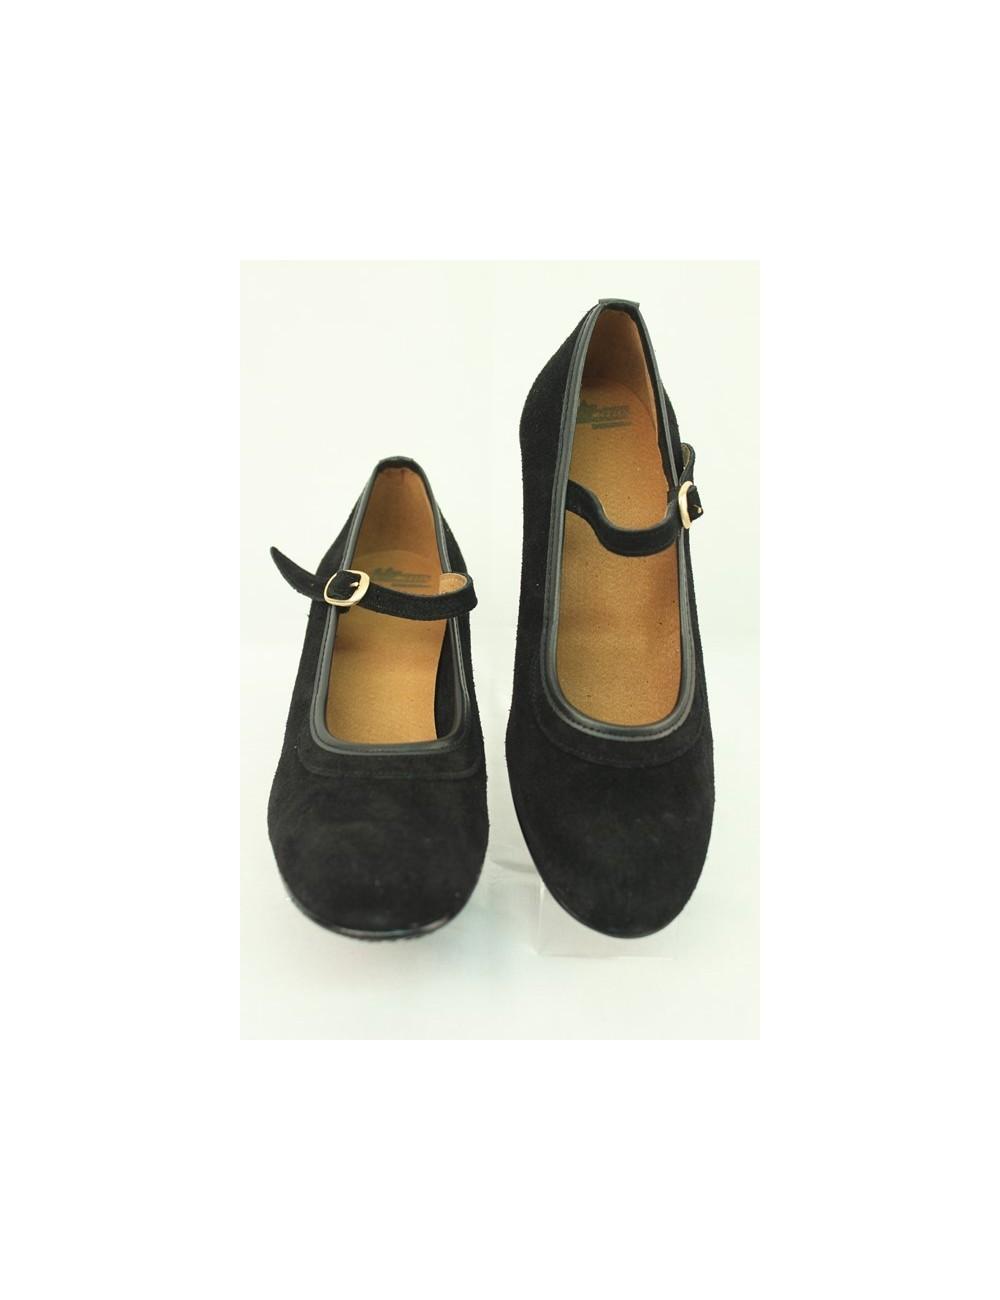 Chaussures Noire Cuir Daim ou Ante Negro